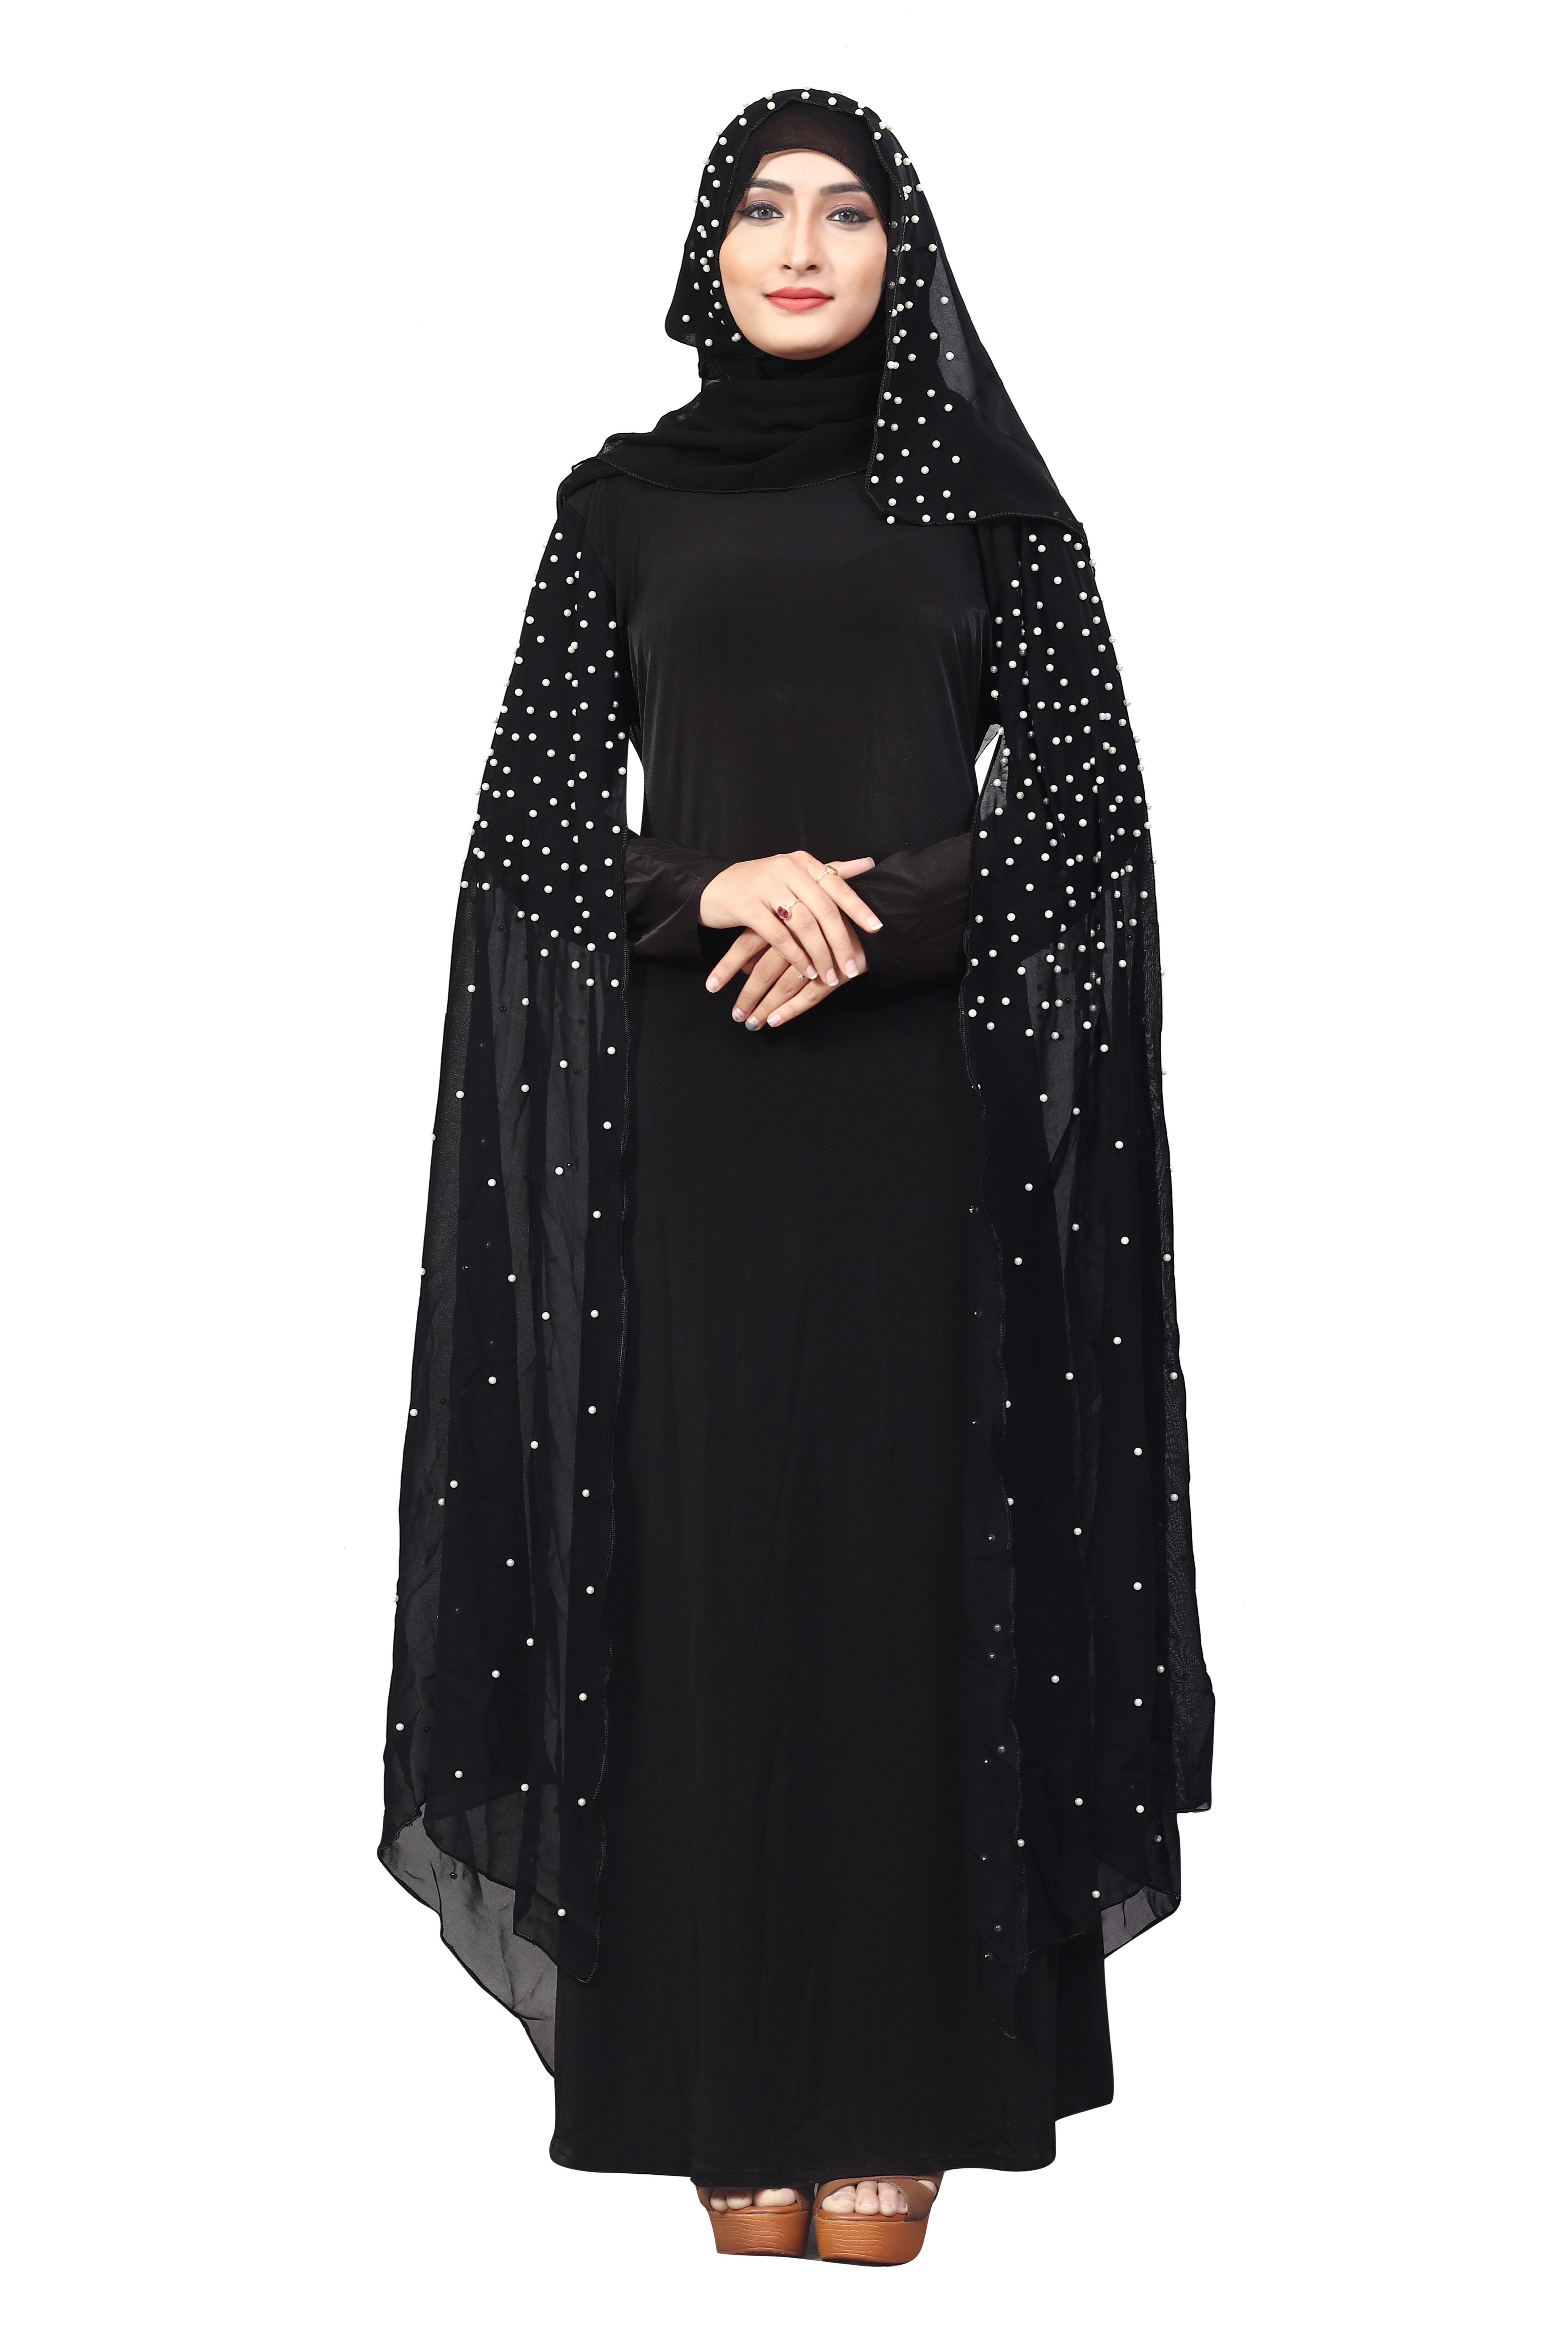 4f7b977b4ece Black Color Lycra And Chiffon Abaya Burkha With Pearl Work And Hijab Scarf  For Women - Justkartit - 2771393